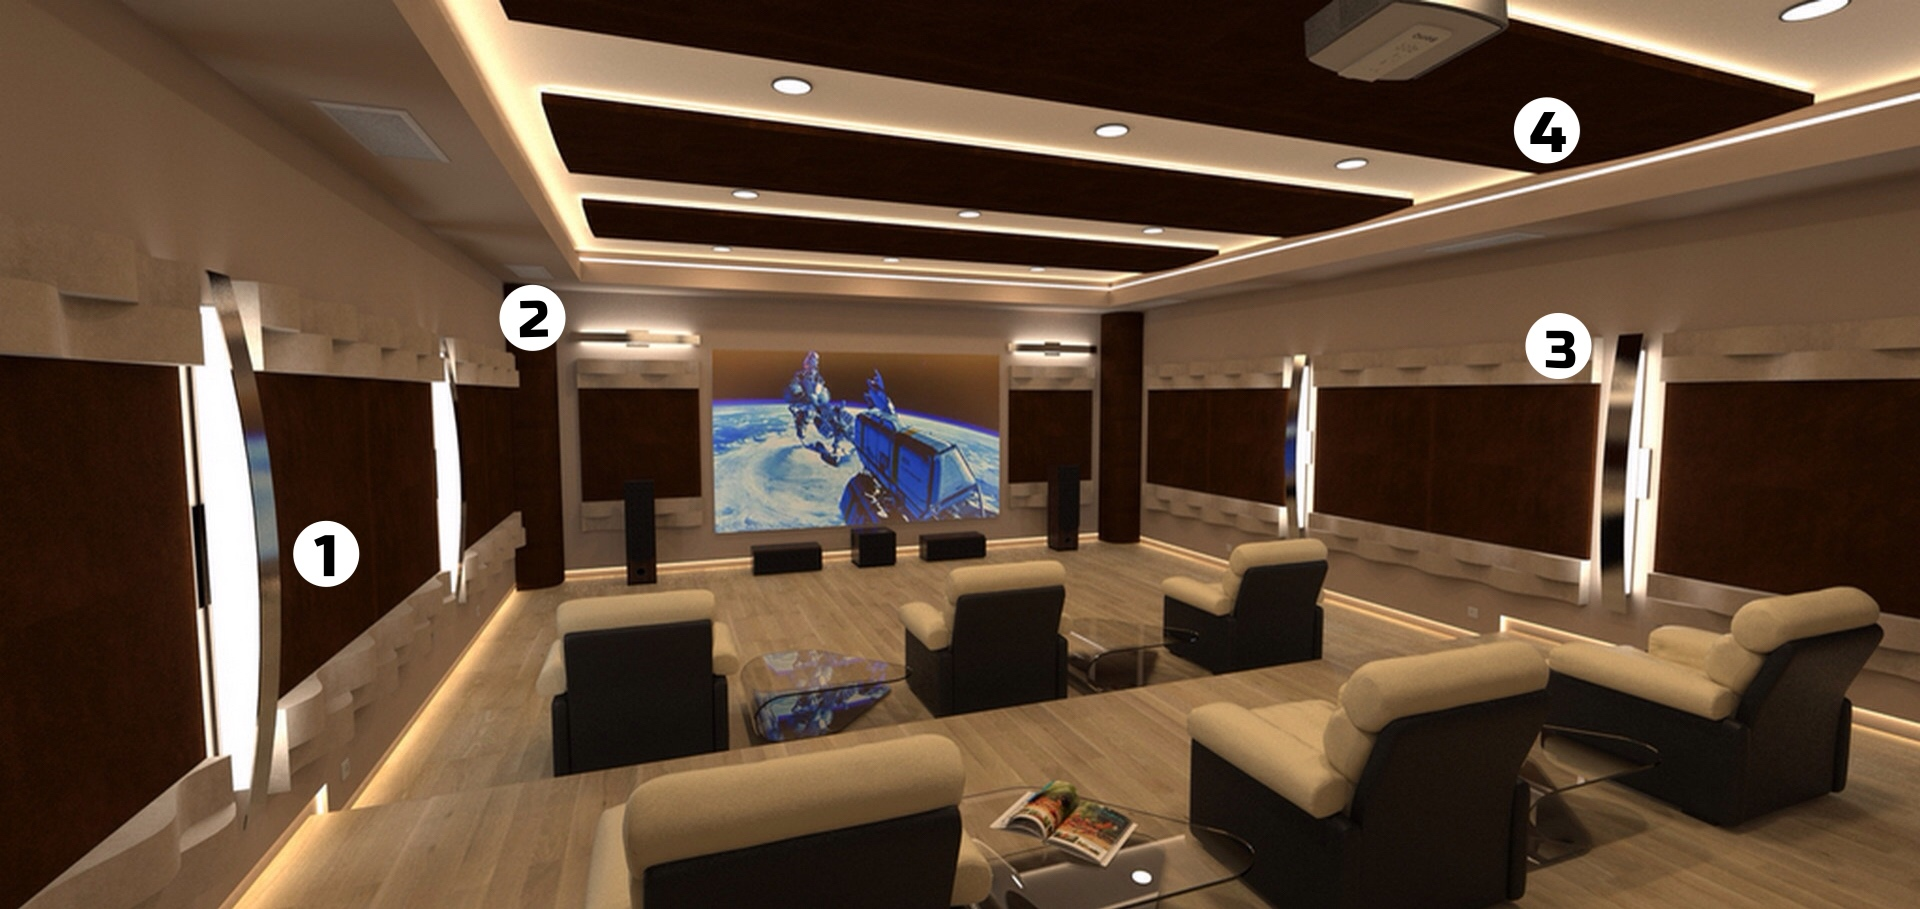 diseño acustico home theatre cinema